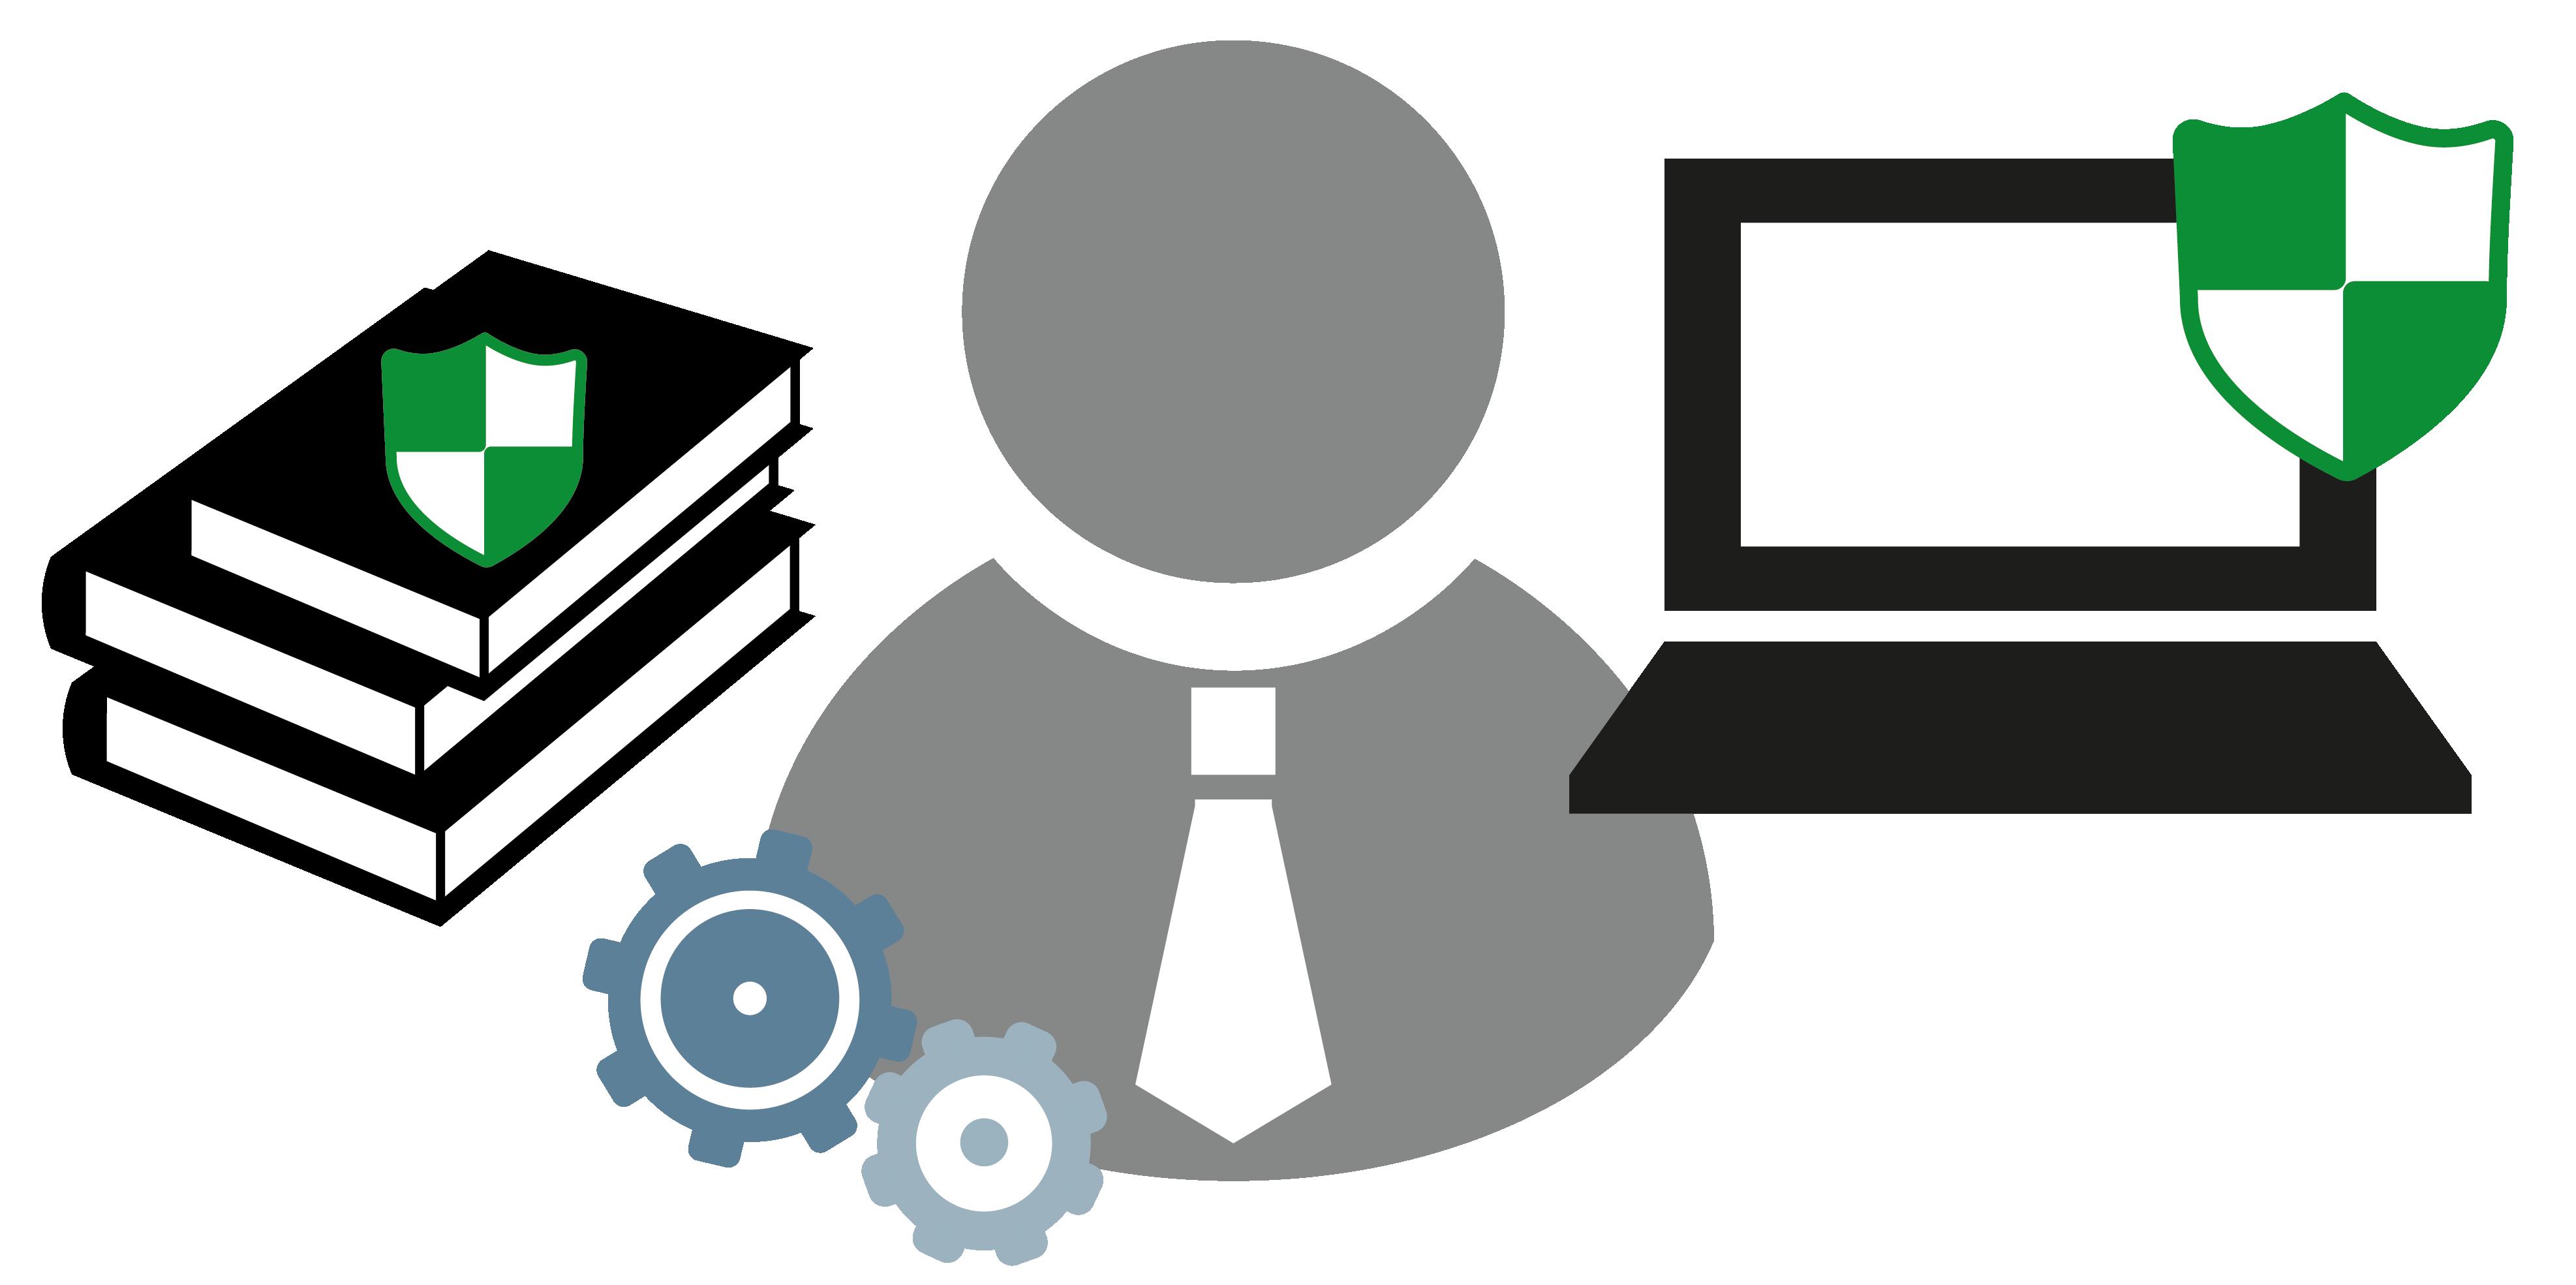 Cyber-Sicherheitsexperte – Glossar Cyber-Sicherheit – Prof. Norbert Pohlmann